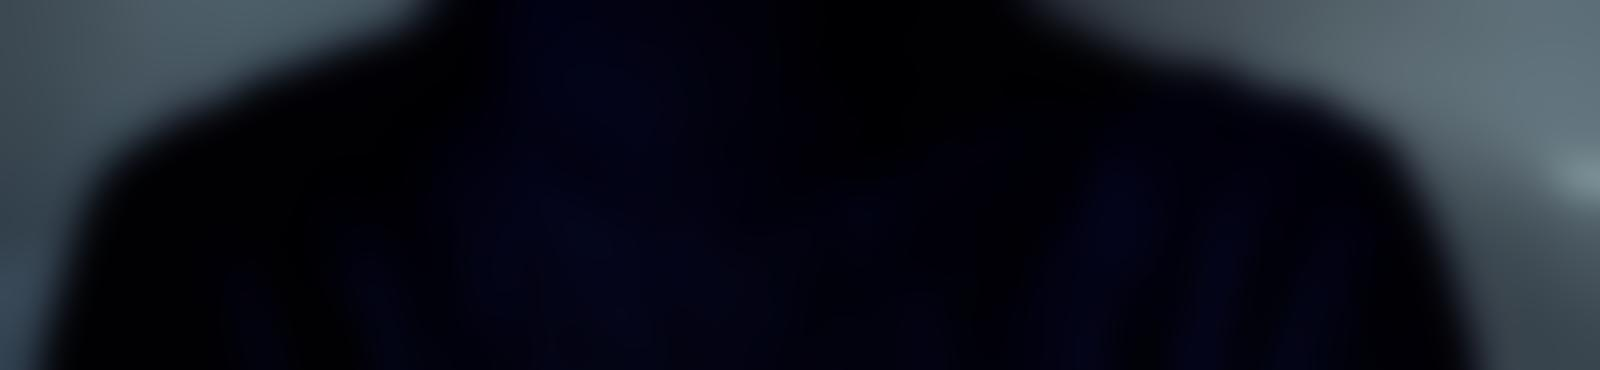 Blurred e93cc811 6814 4884 ba51 13c7406dc4e8